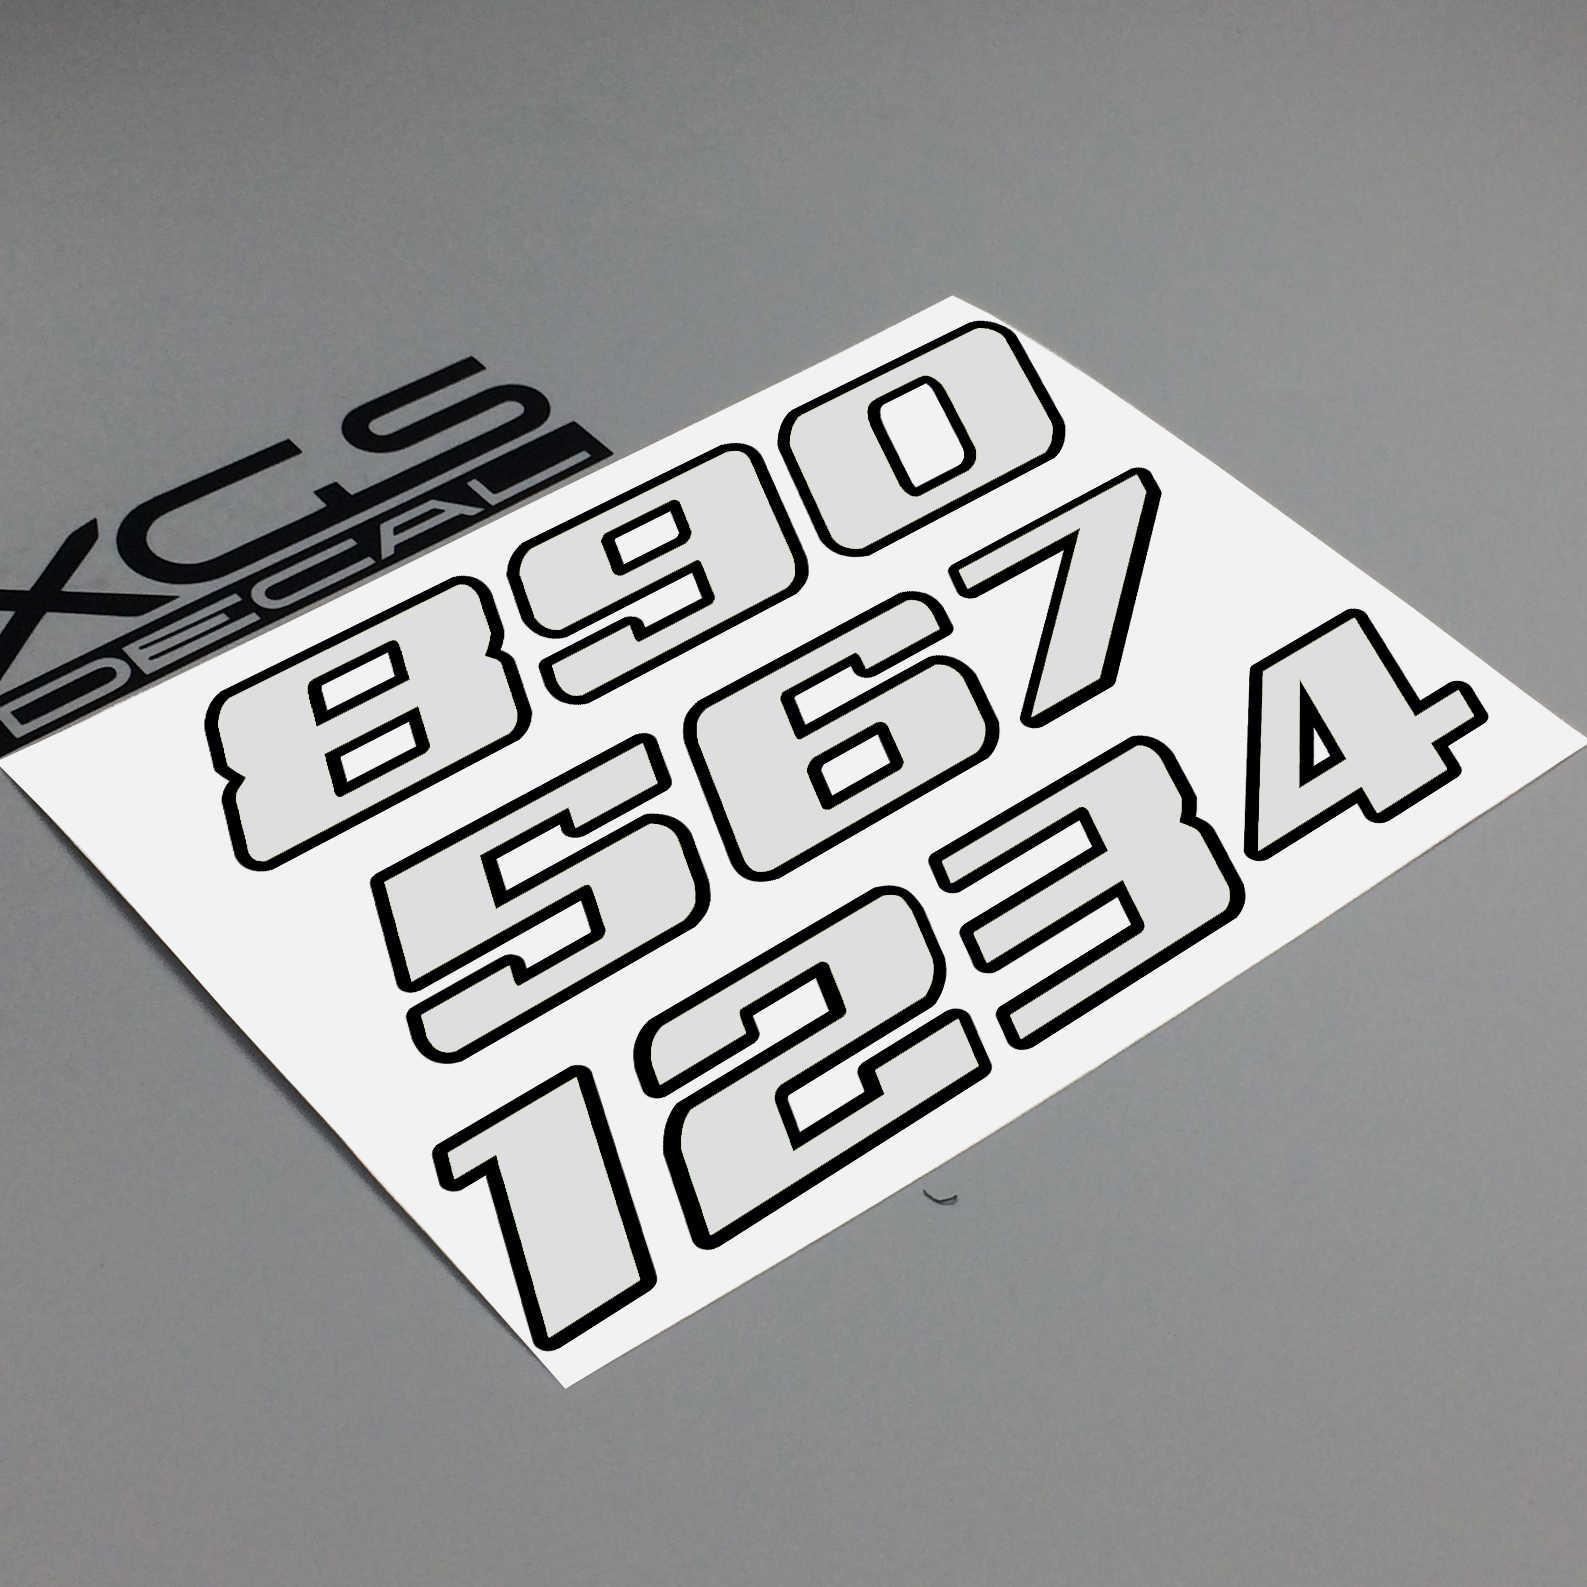 Xgs Stiker Mobil Stiker Nomor Neon Neon Double Layer Vinyl Cut Motor ATV Helm Stiker Outdoor Stiker